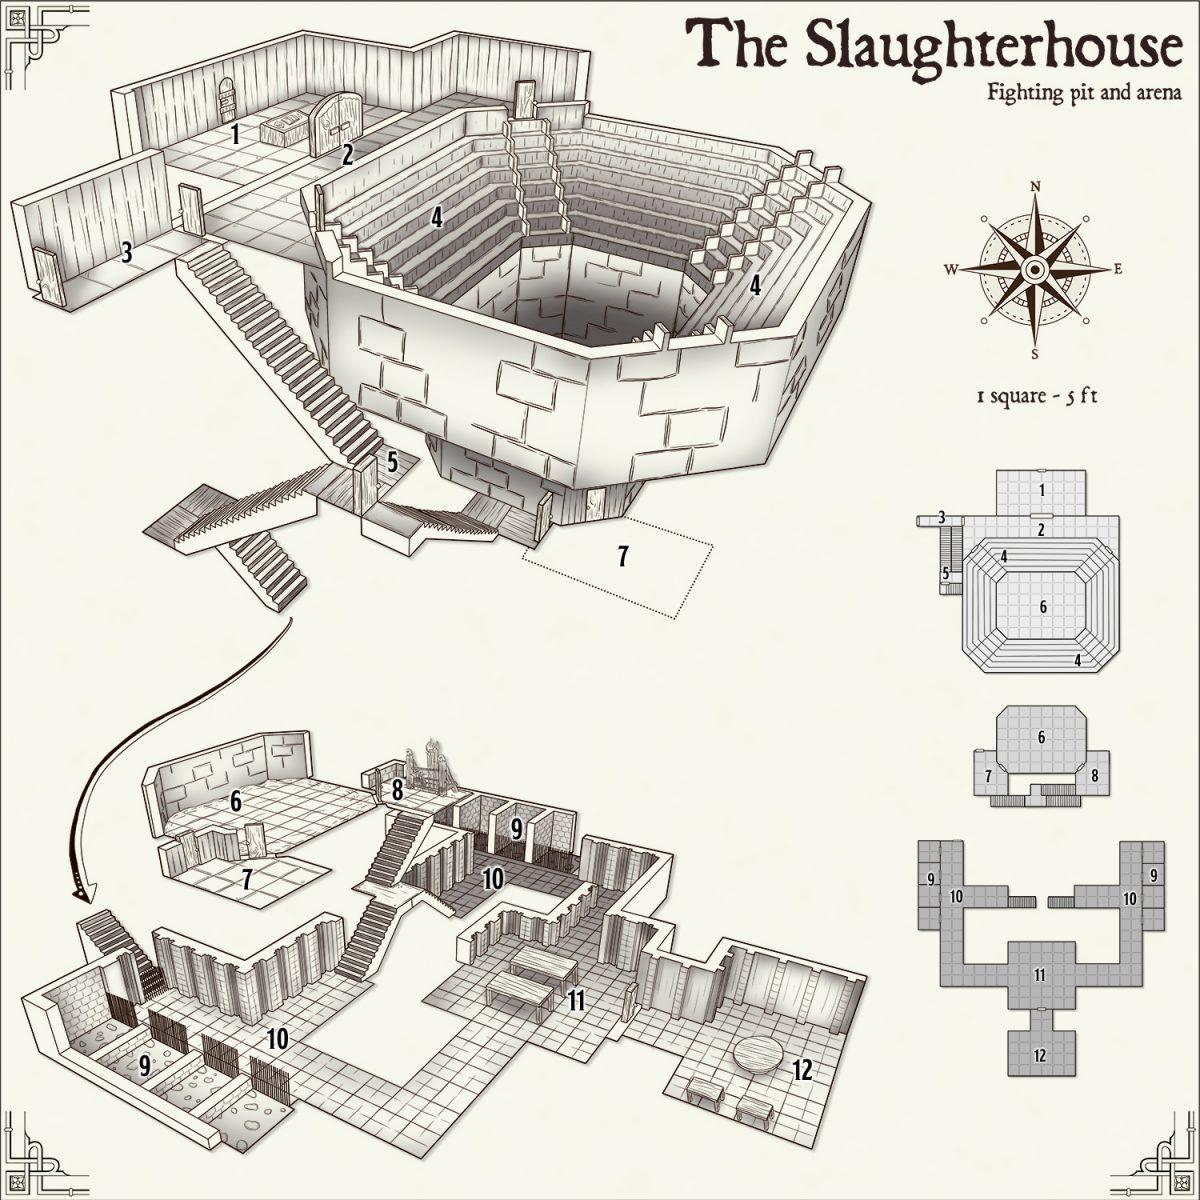 374 The Slaughterhouse